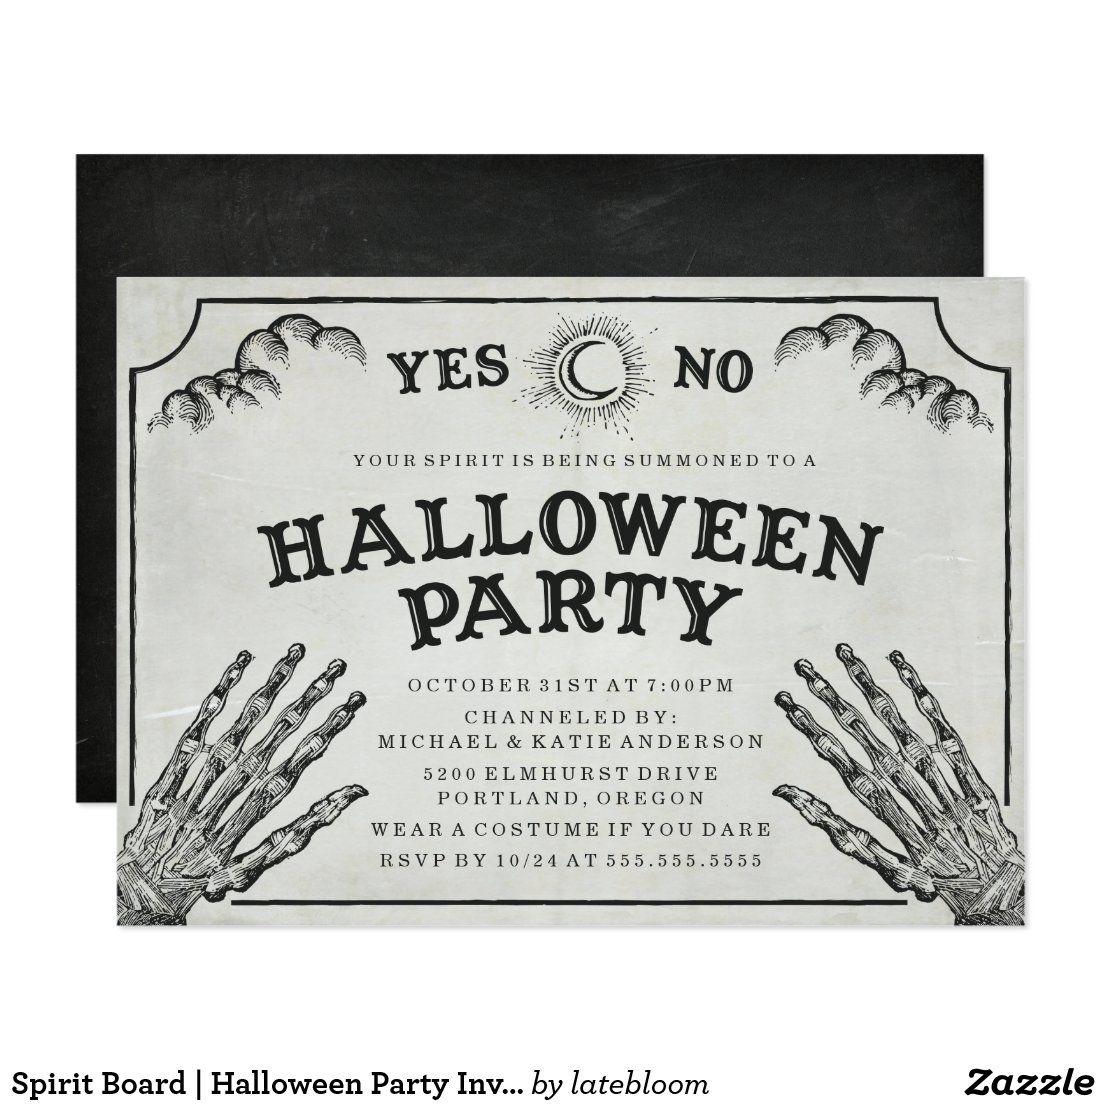 Spirit board halloween party invitation in